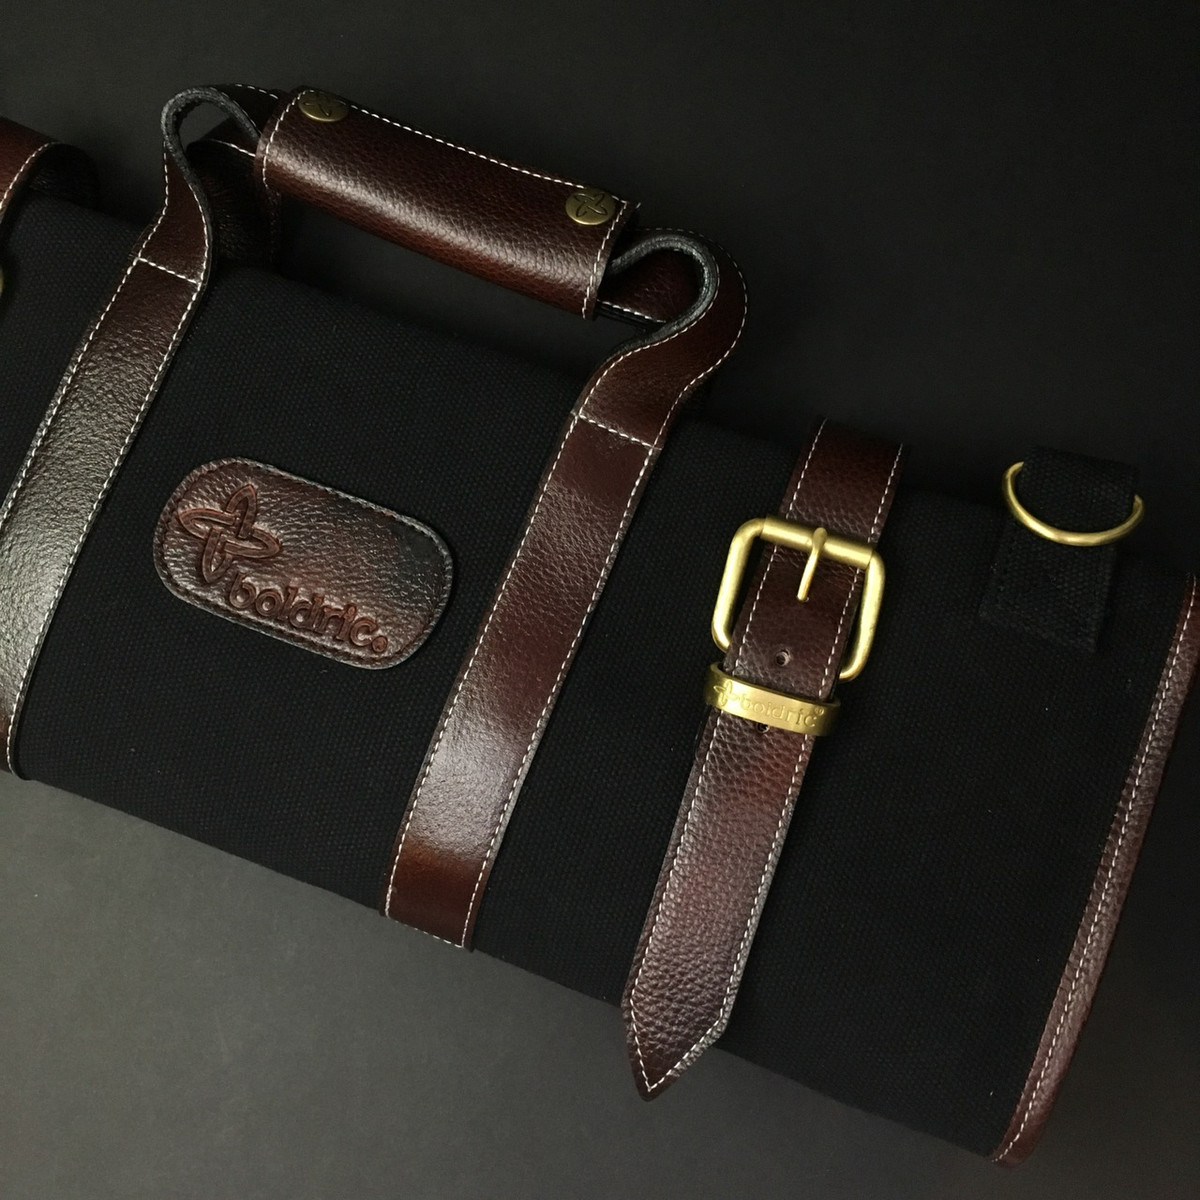 Boldric - 17 pocket - Black